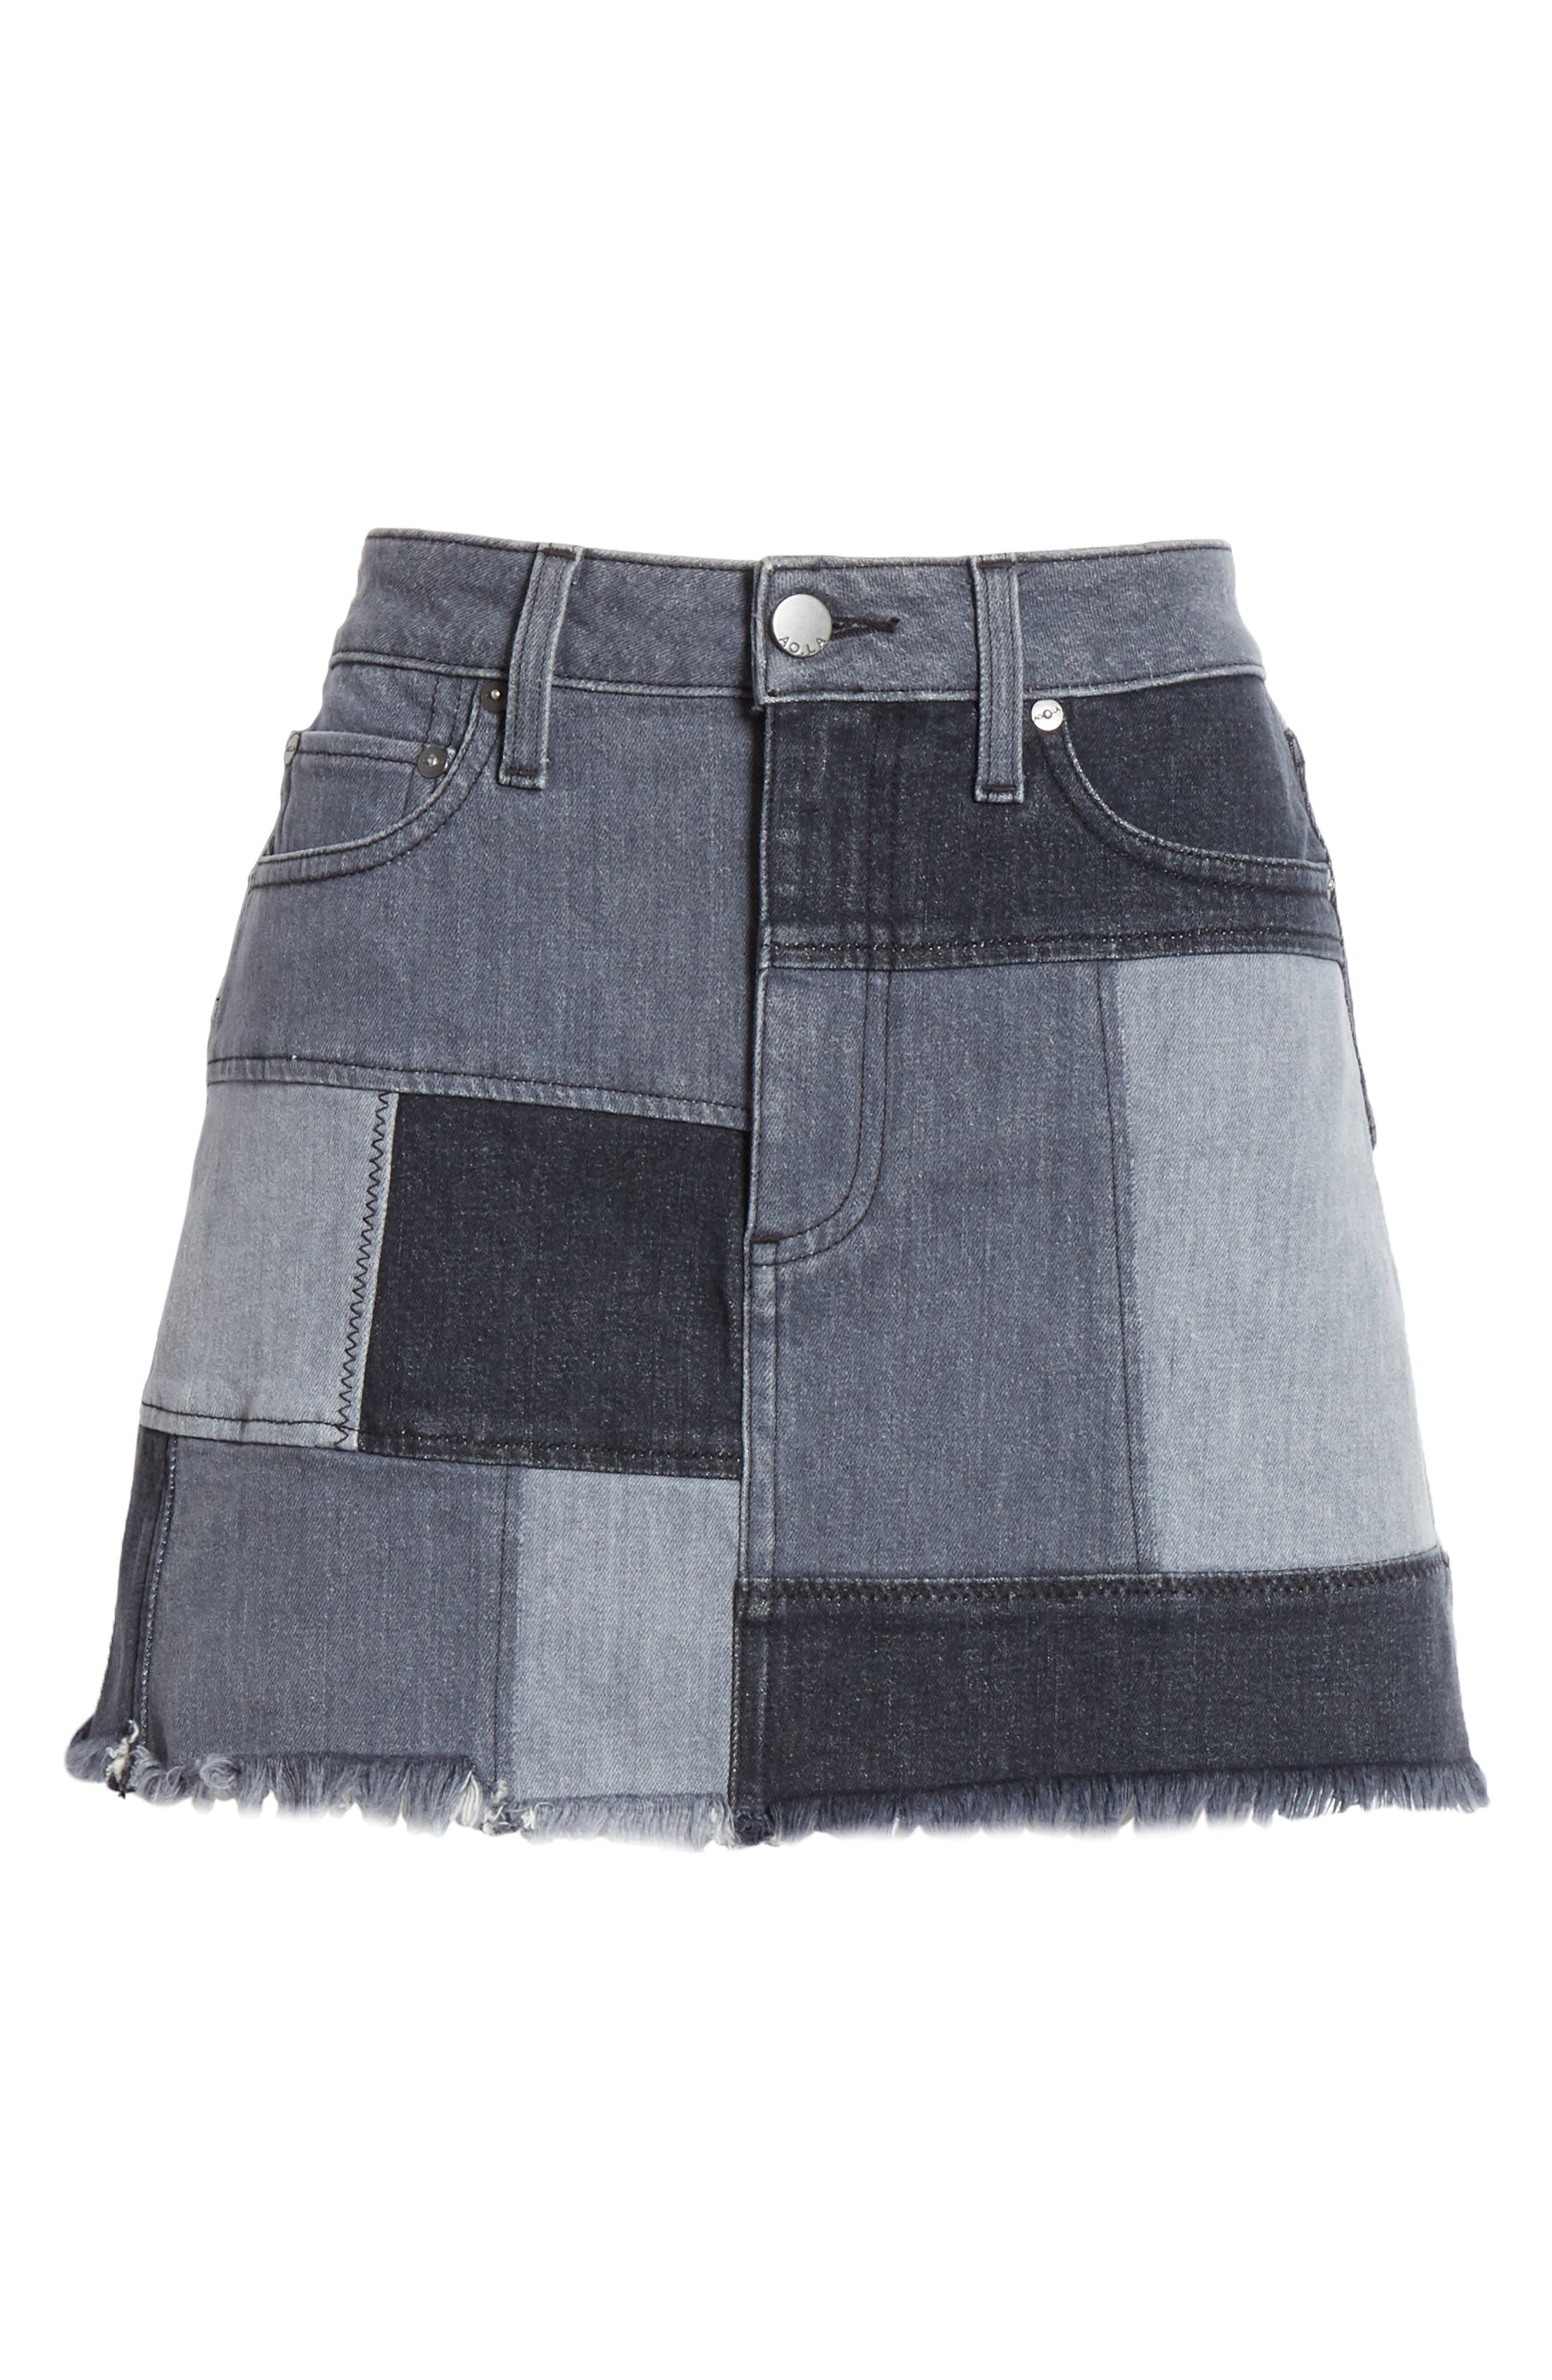 ALICE + OLIVIA JEANS,                             Amazing Patchwork Denim Miniskirt,                             Alternate thumbnail 6, color,                             NIGHT SKY